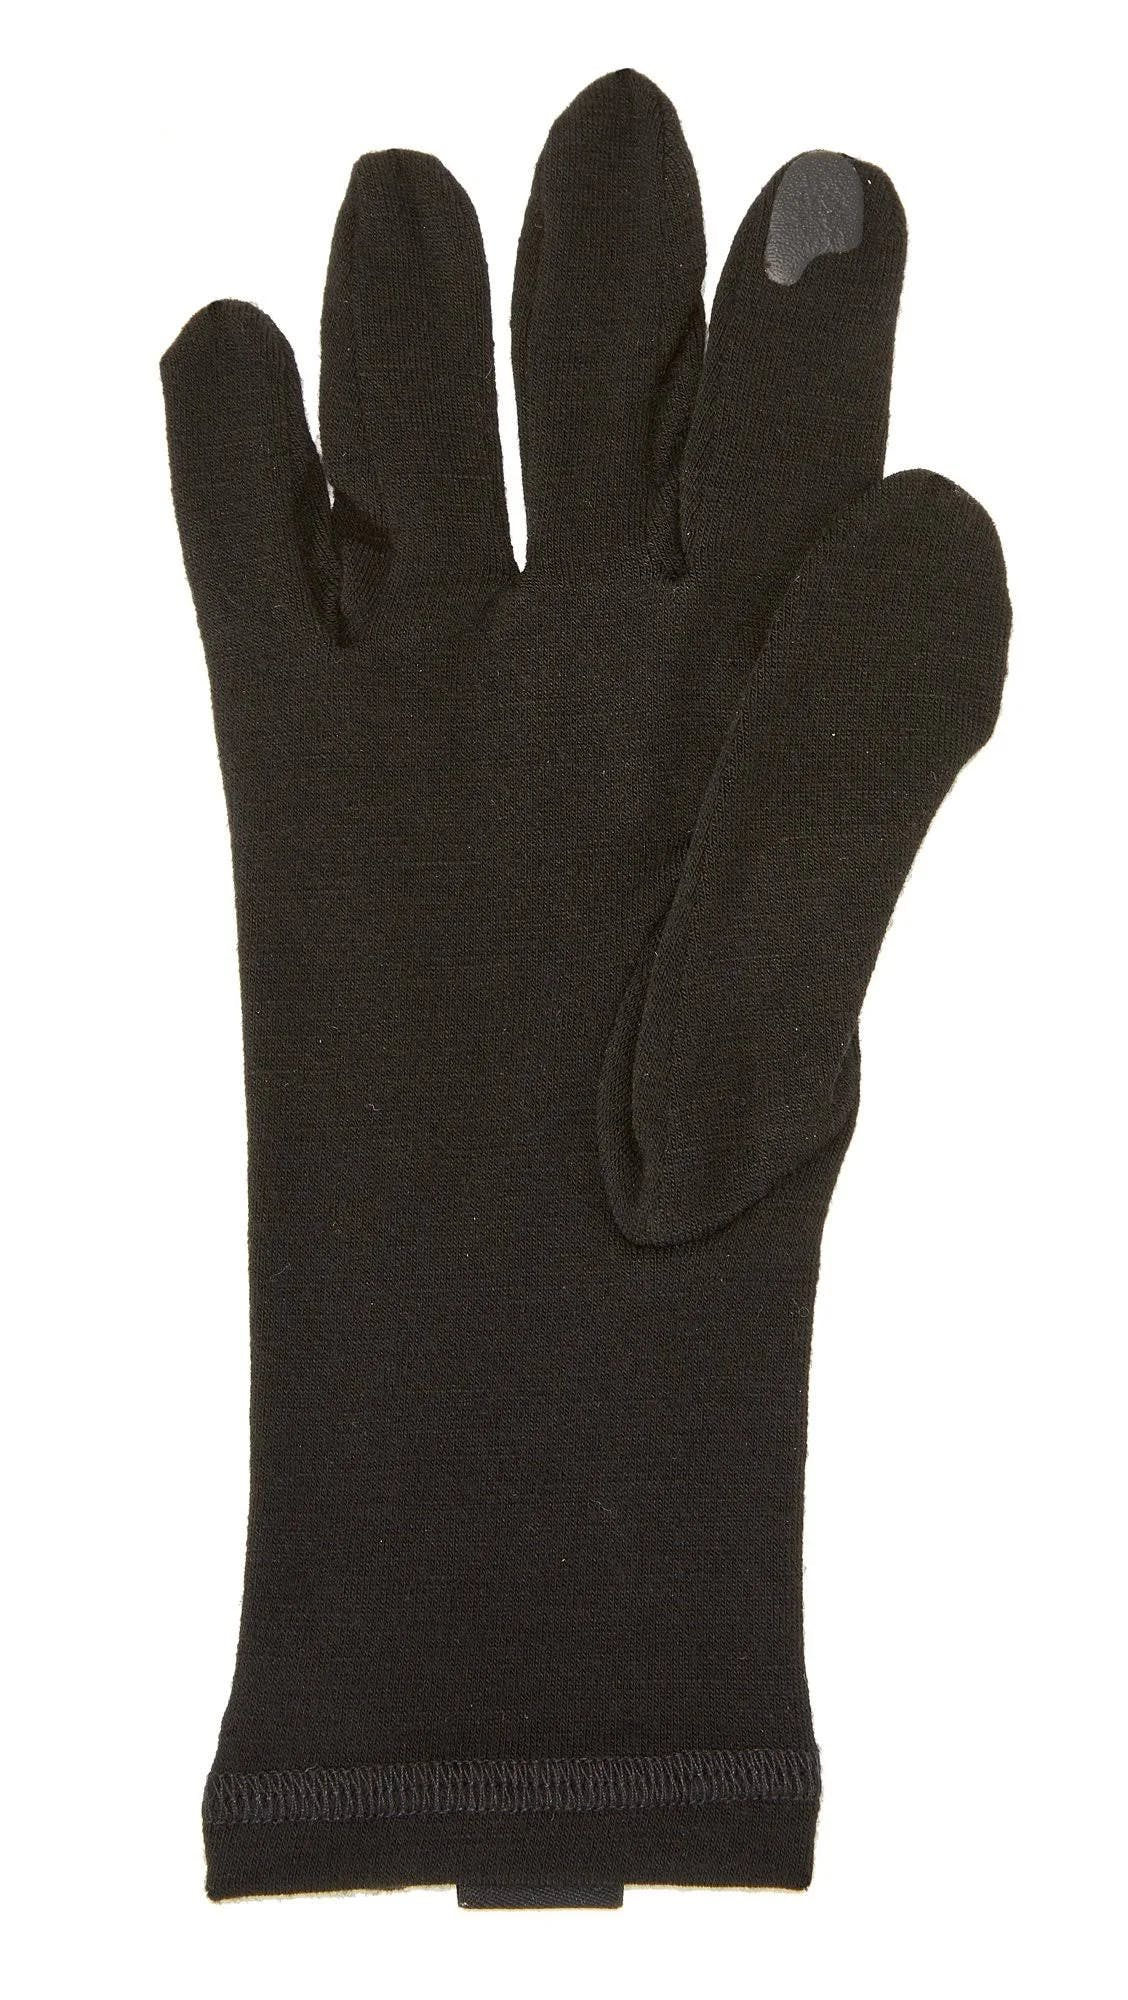 Arc'teryx Gothic Glove-black-xl